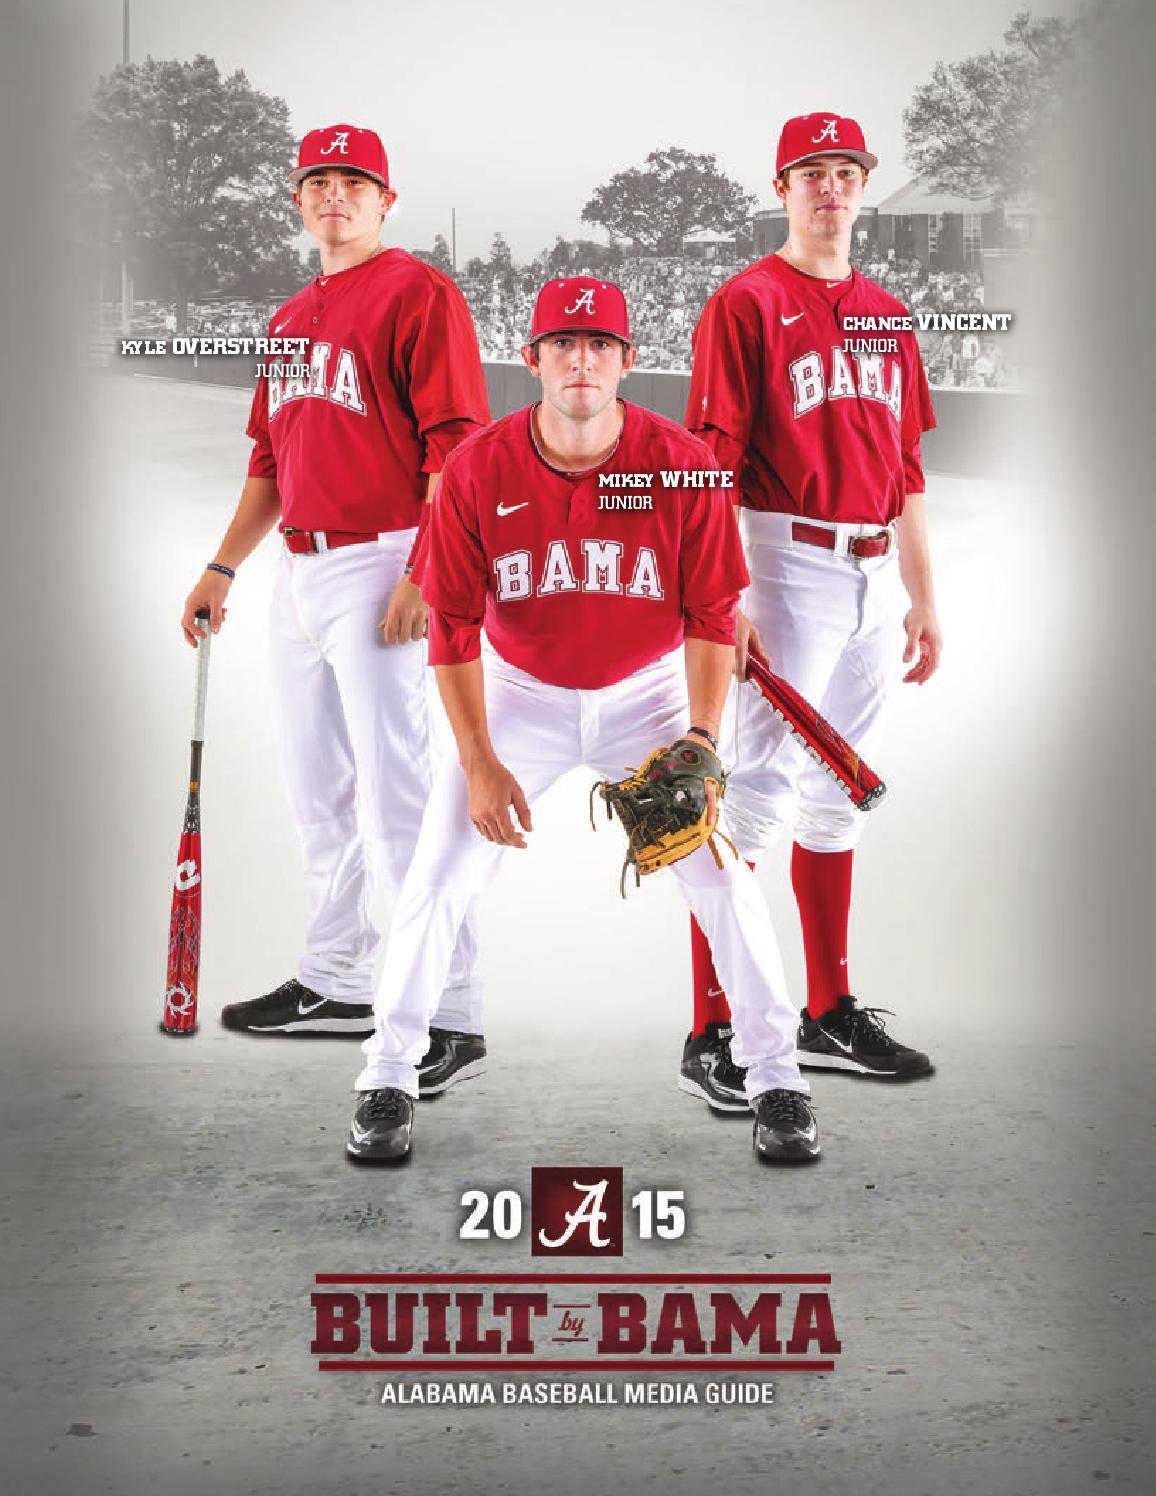 2015 Baseball Media Guide by Alabama Crimson Tide - issuu b6a375832